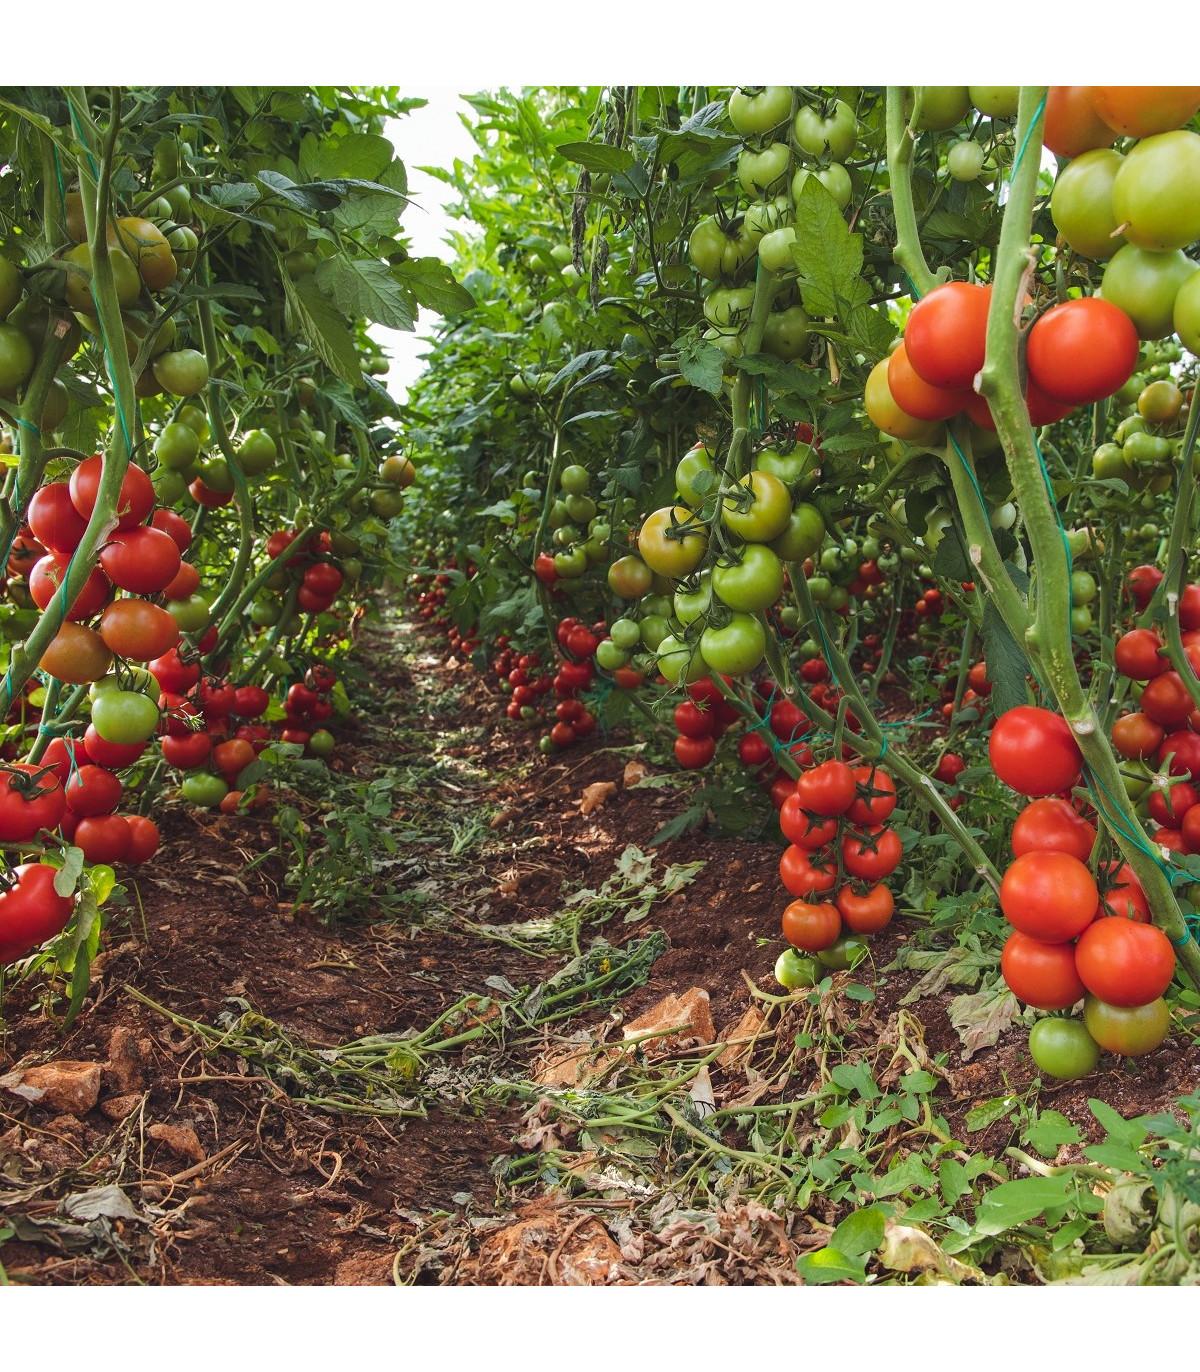 BIO paradajka kolíková Matina - Lycopersicon lycopersicum - rajčiak - bio semená rajčiaka - 15 ks